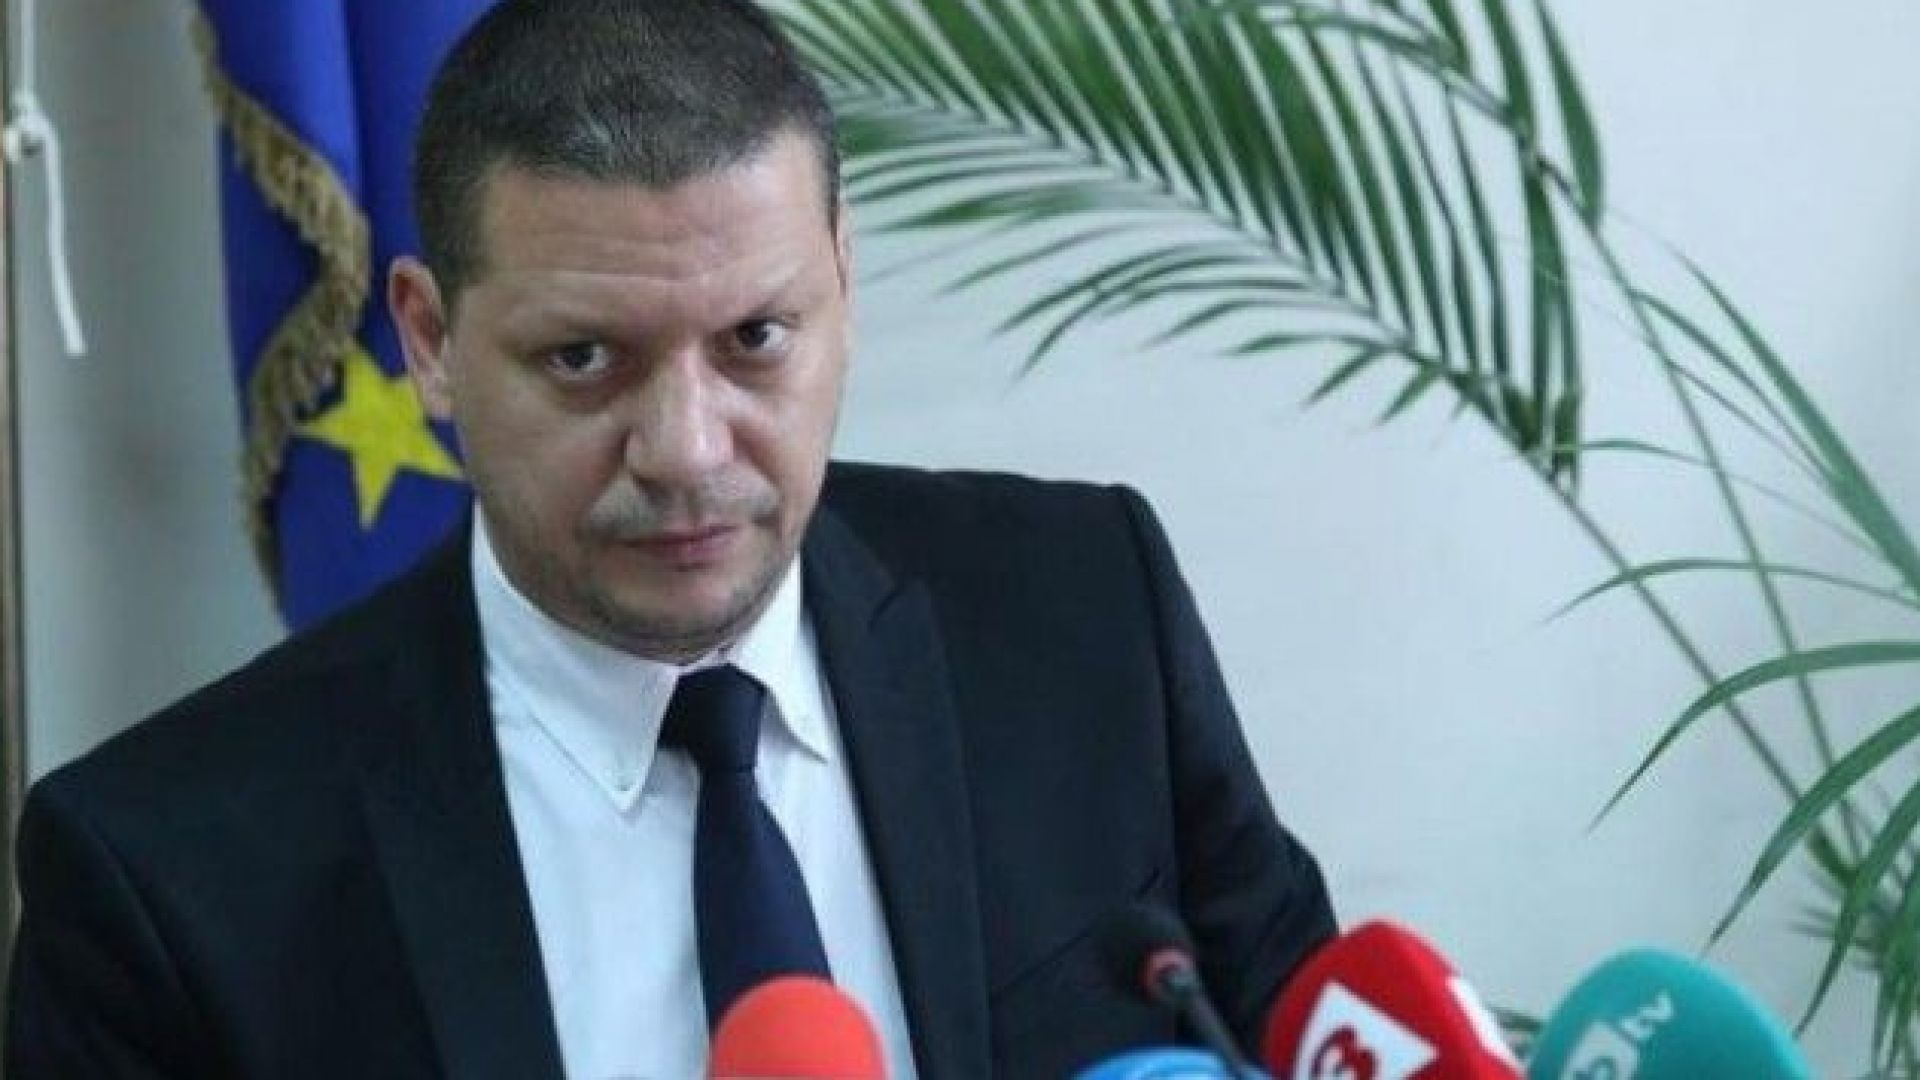 Илиан Тодоров пред Dir.bg: Може да подам оставка като областен управител в понеделник